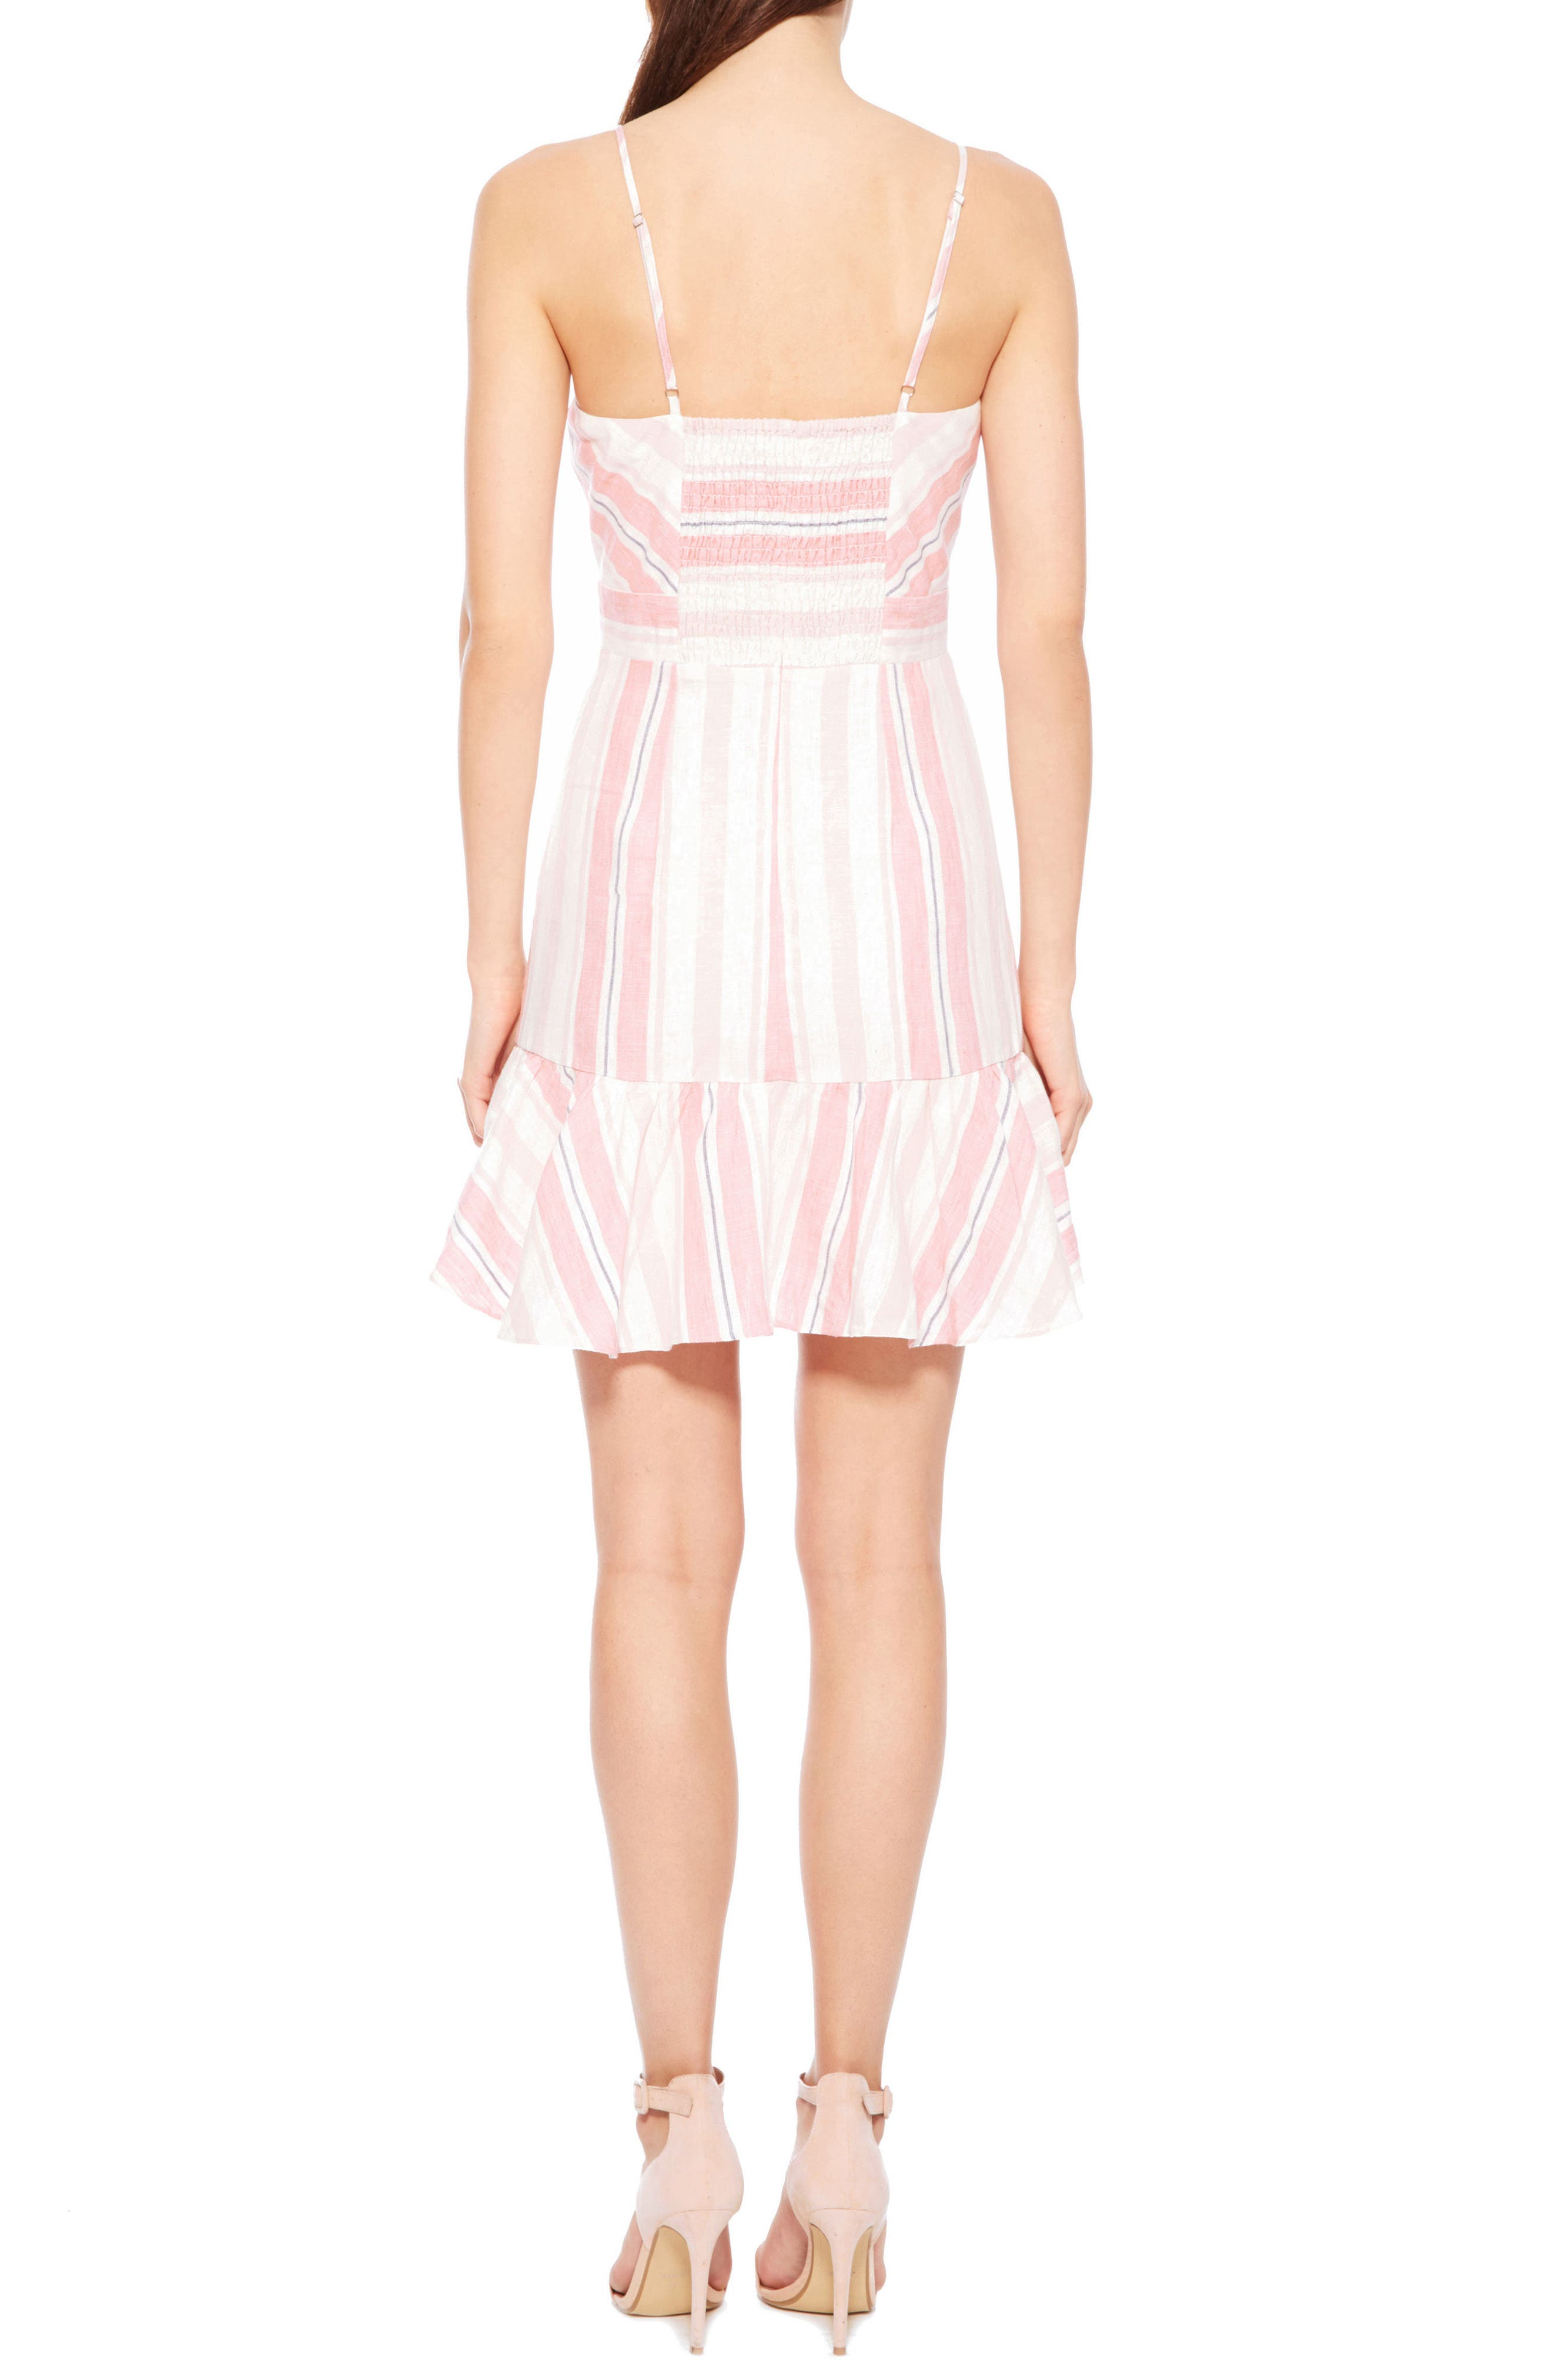 Dany Dress,                             Alternate thumbnail 2, color,                             906